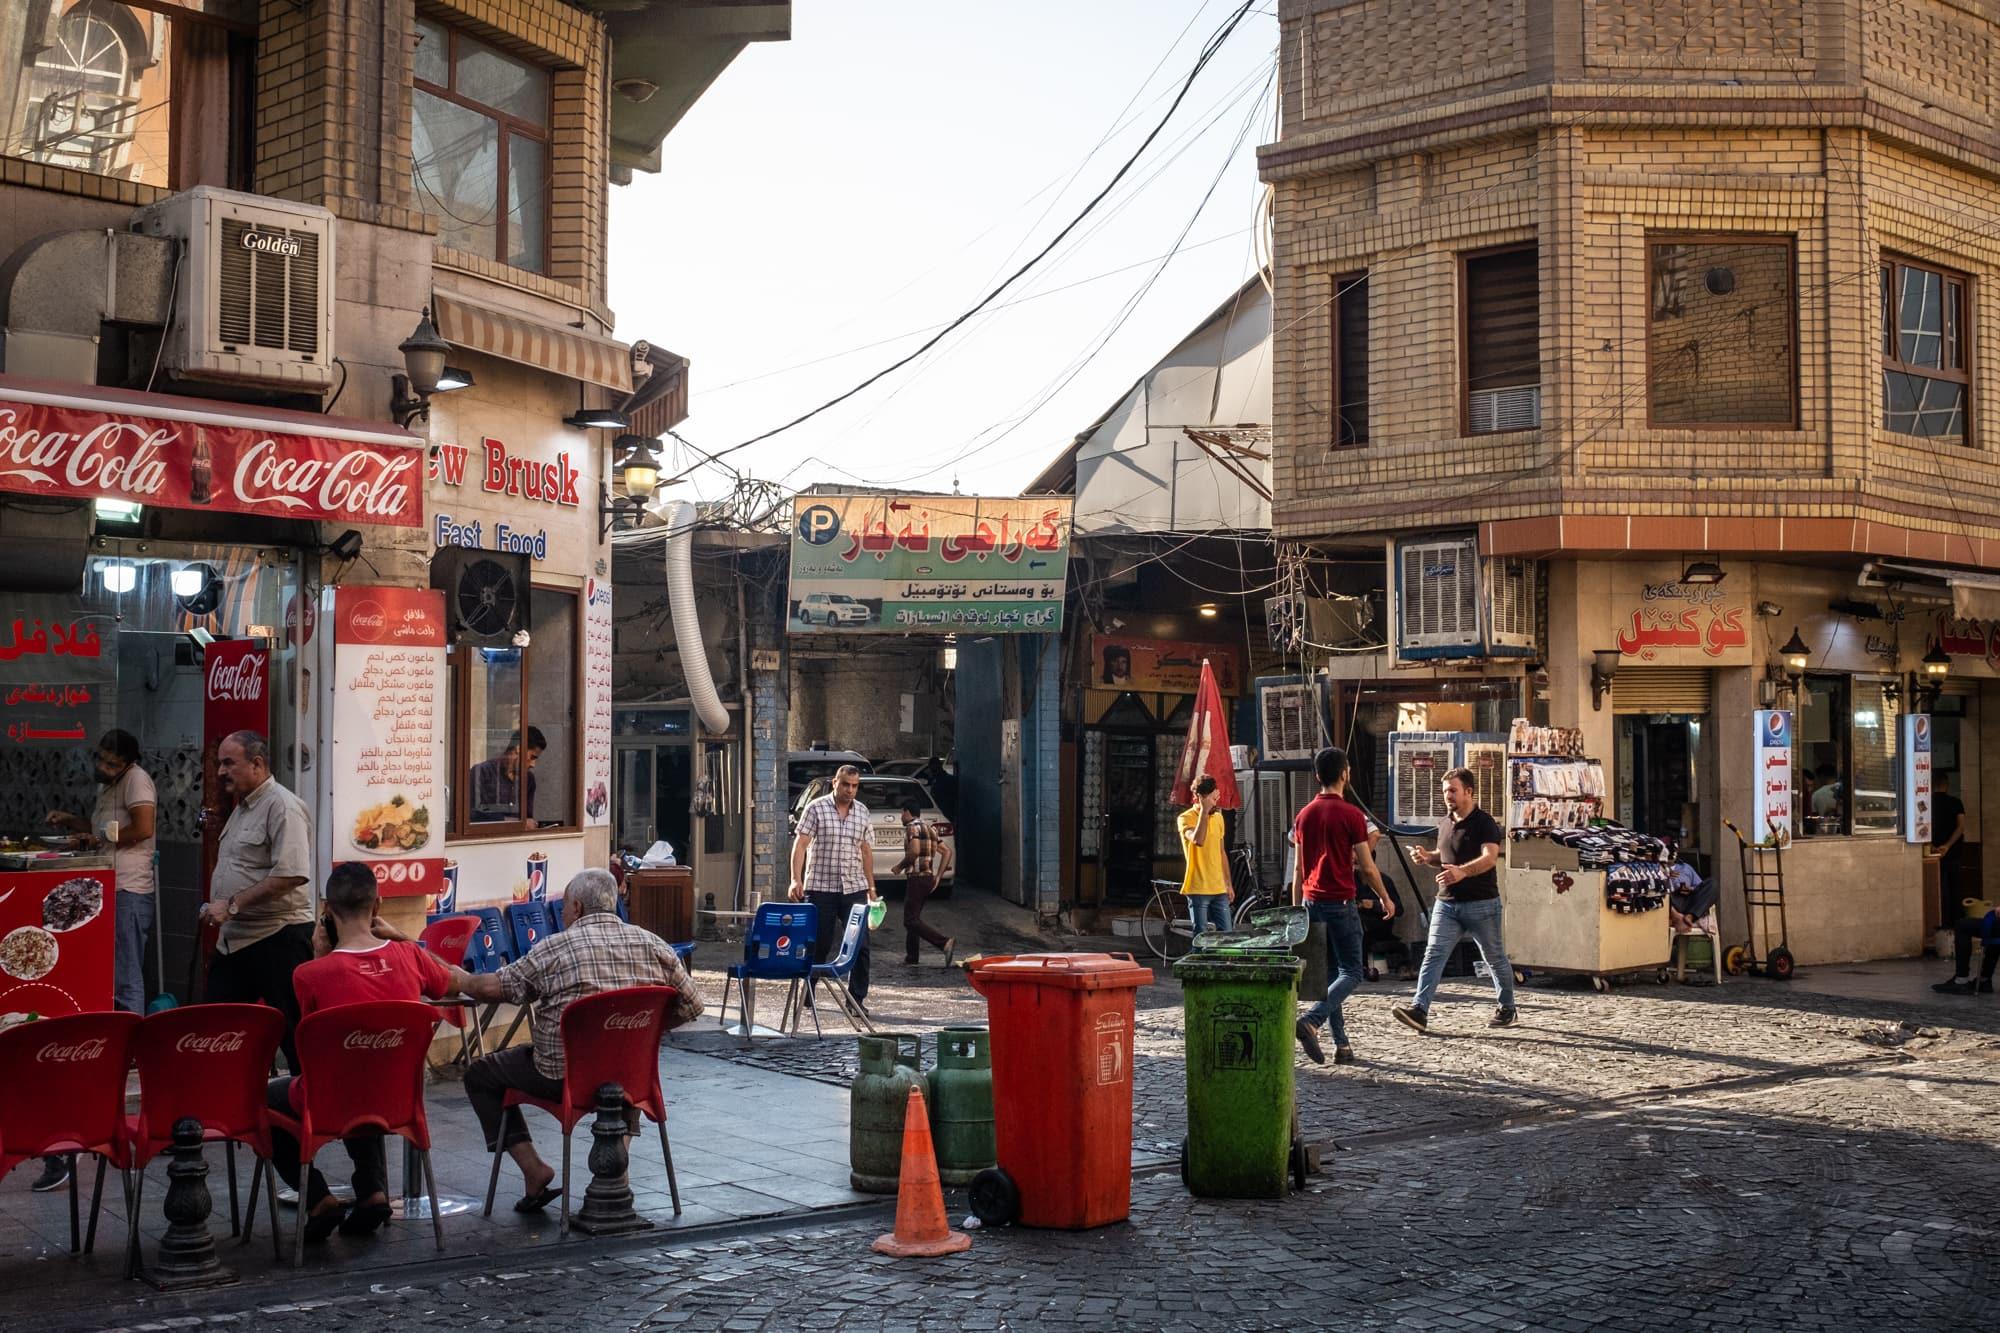 Street scene in the city center of Erbil, Iraq, on Sept 3rd, 2019.